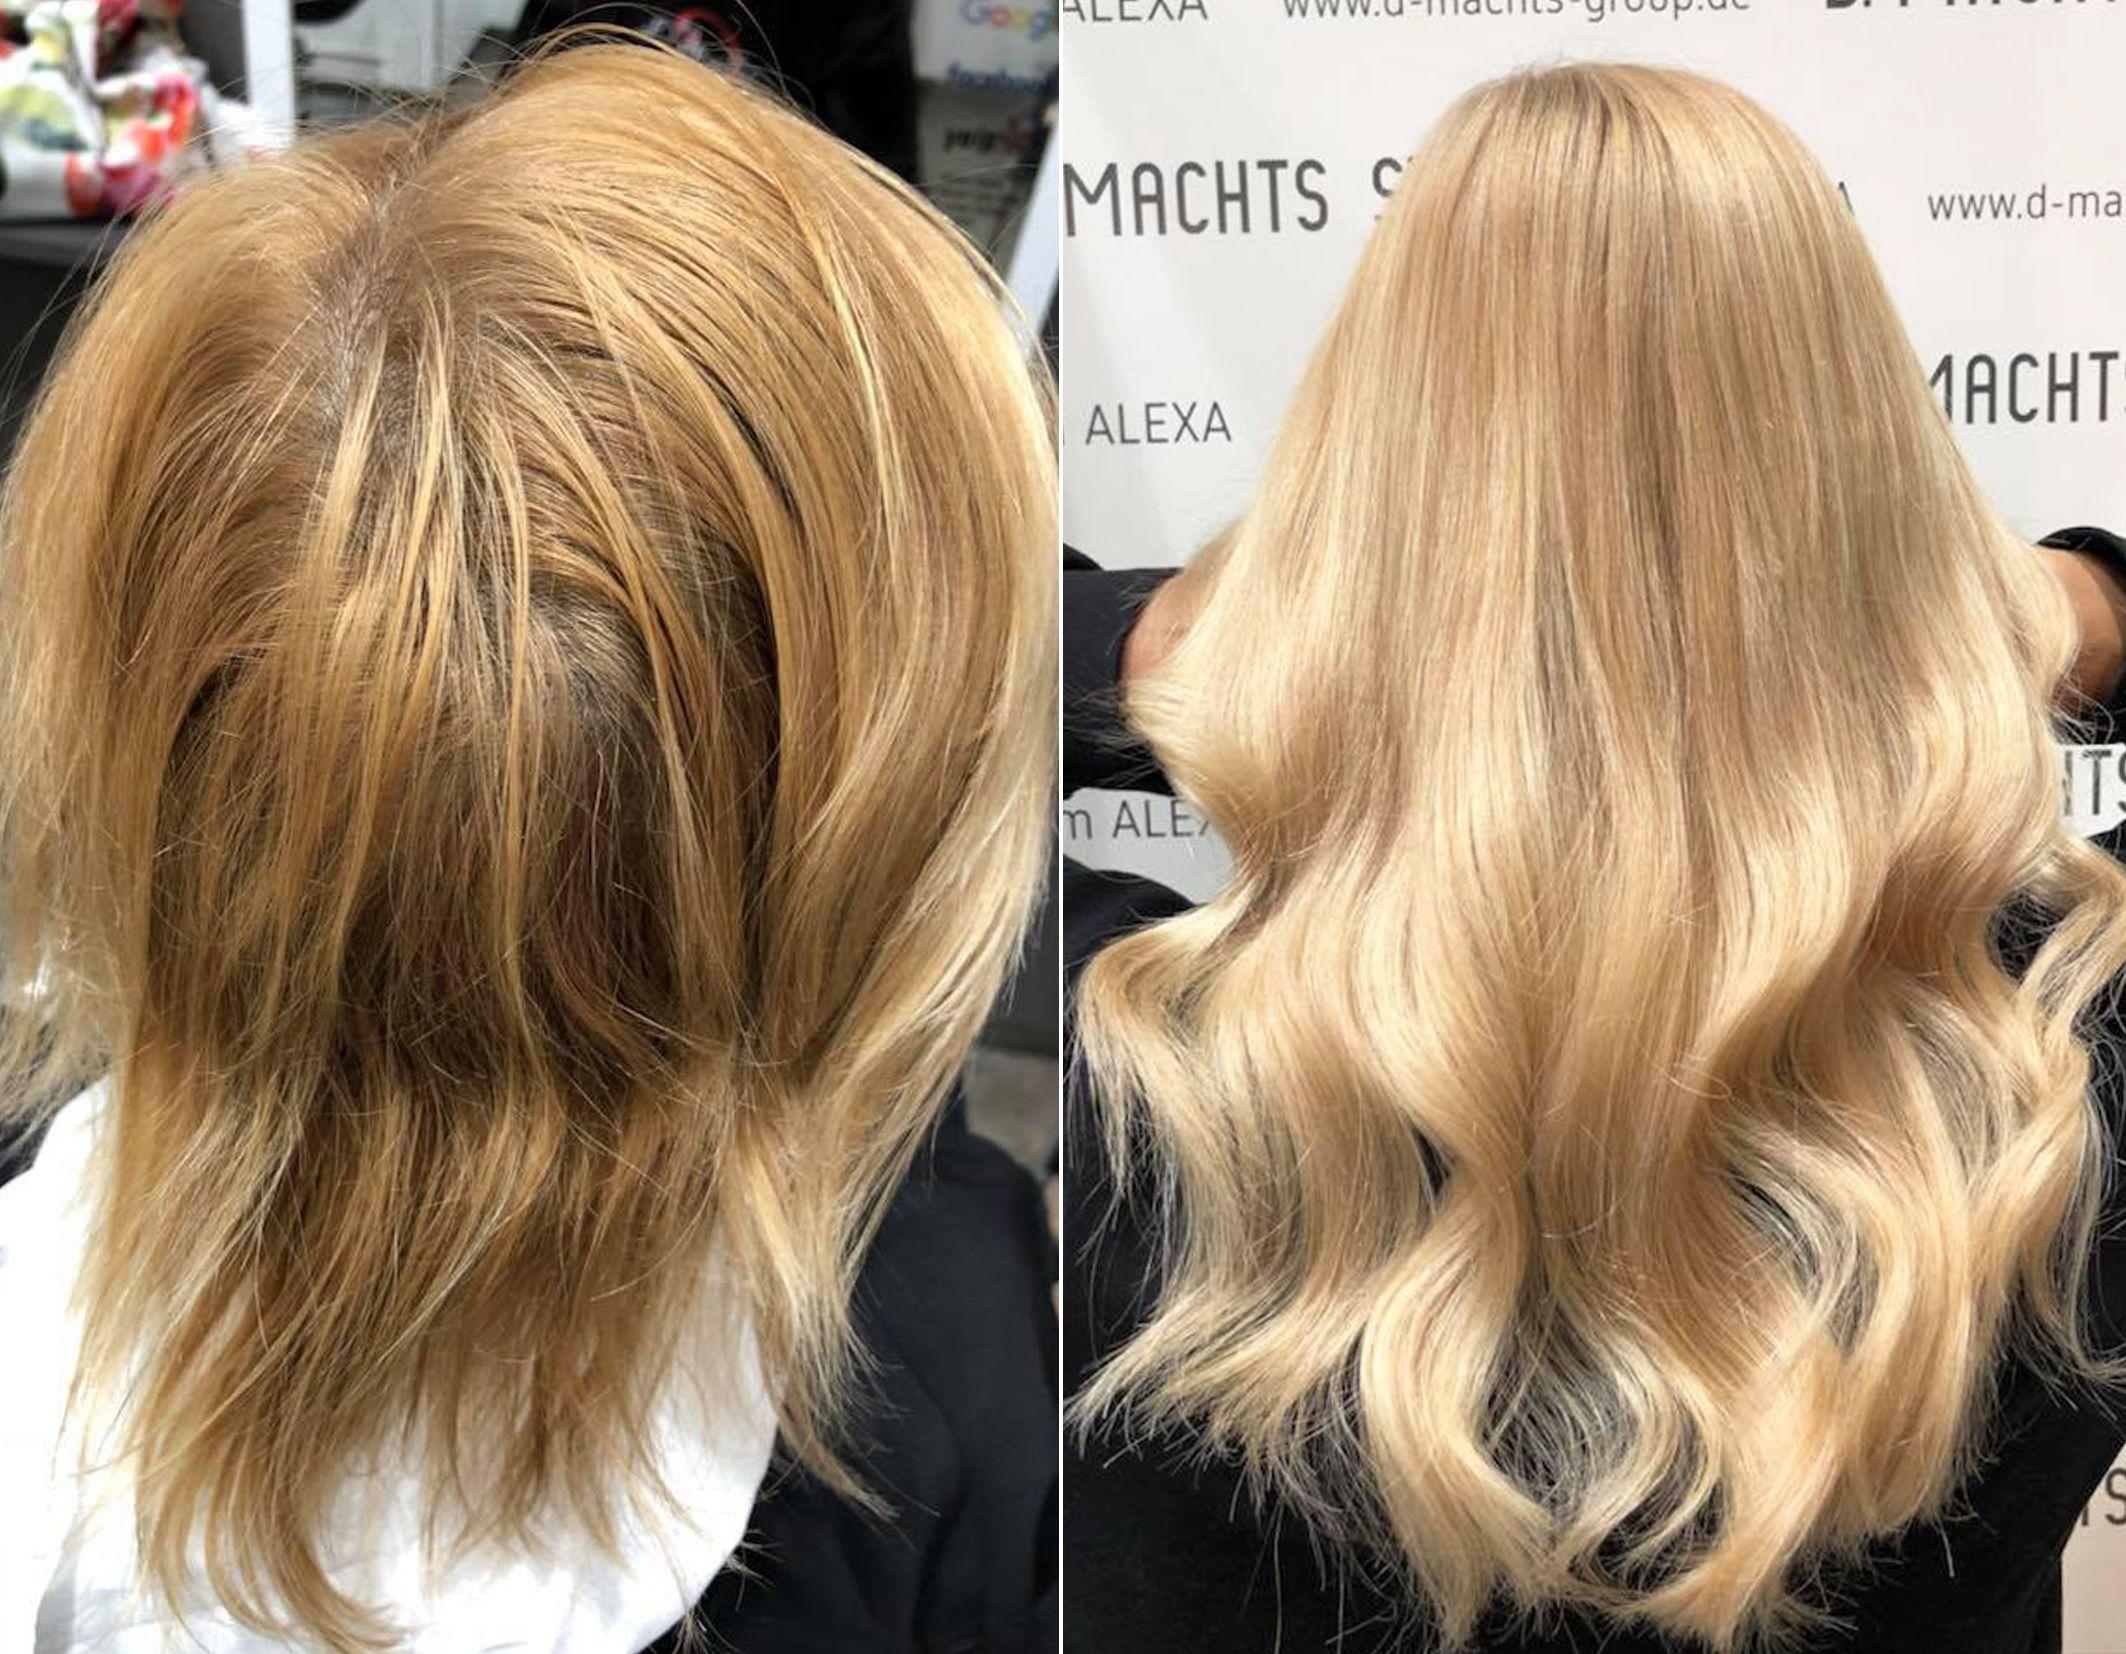 Hair Extensions Haarverlangerung Friseur D Machts Style Alexa In Berlin Extensions Dmachtsstylealexa Hair B Friseur Berlin Haarverlangerung Haarschnitt